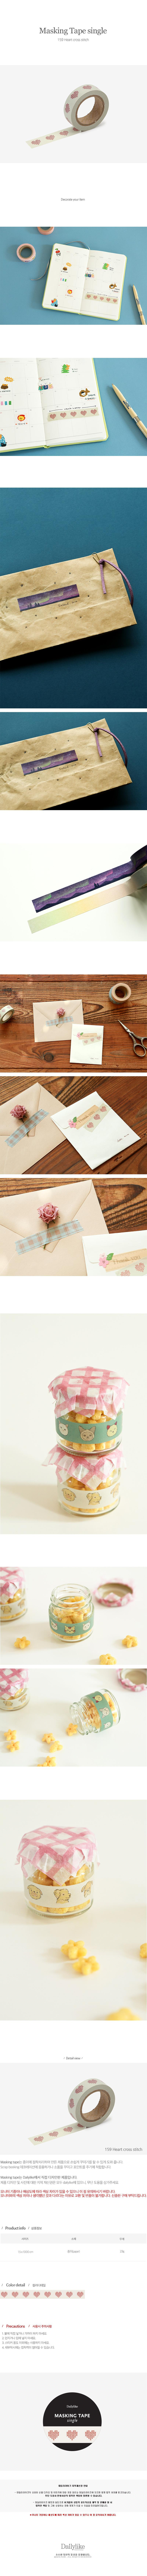 Masking tape single - 159 Heart cross stitch2,400원-데일리라이크디자인문구, 데코레이션, 마스킹 테이프, 종이 마스킹테이프바보사랑Masking tape single - 159 Heart cross stitch2,400원-데일리라이크디자인문구, 데코레이션, 마스킹 테이프, 종이 마스킹테이프바보사랑